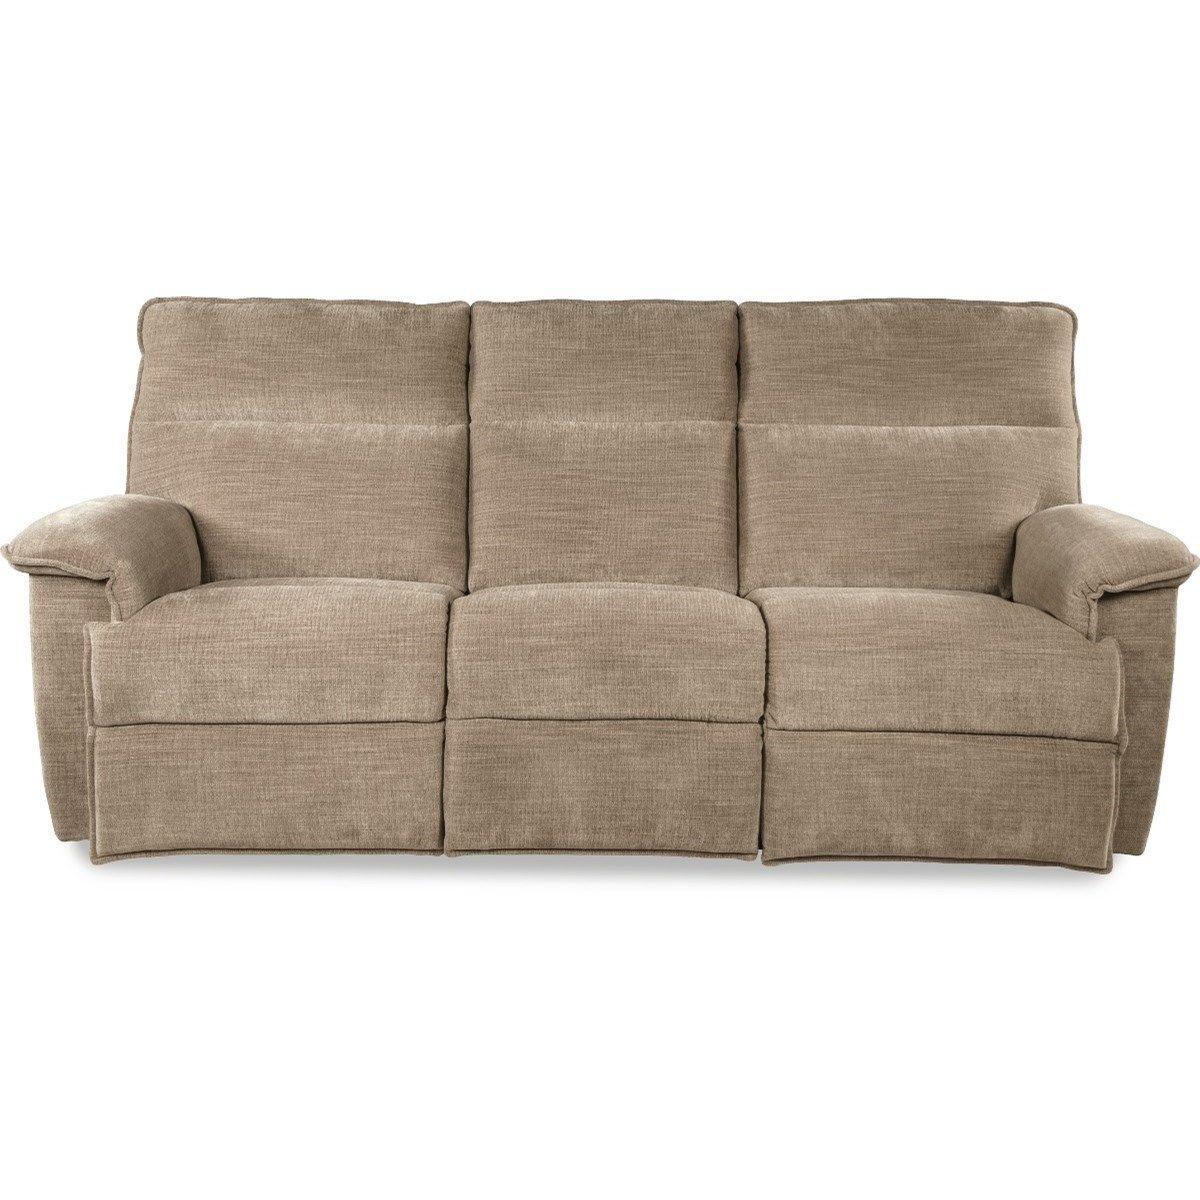 Jay La Z Time Full Reclining Sofa By La Z Boy At Vandrie Home